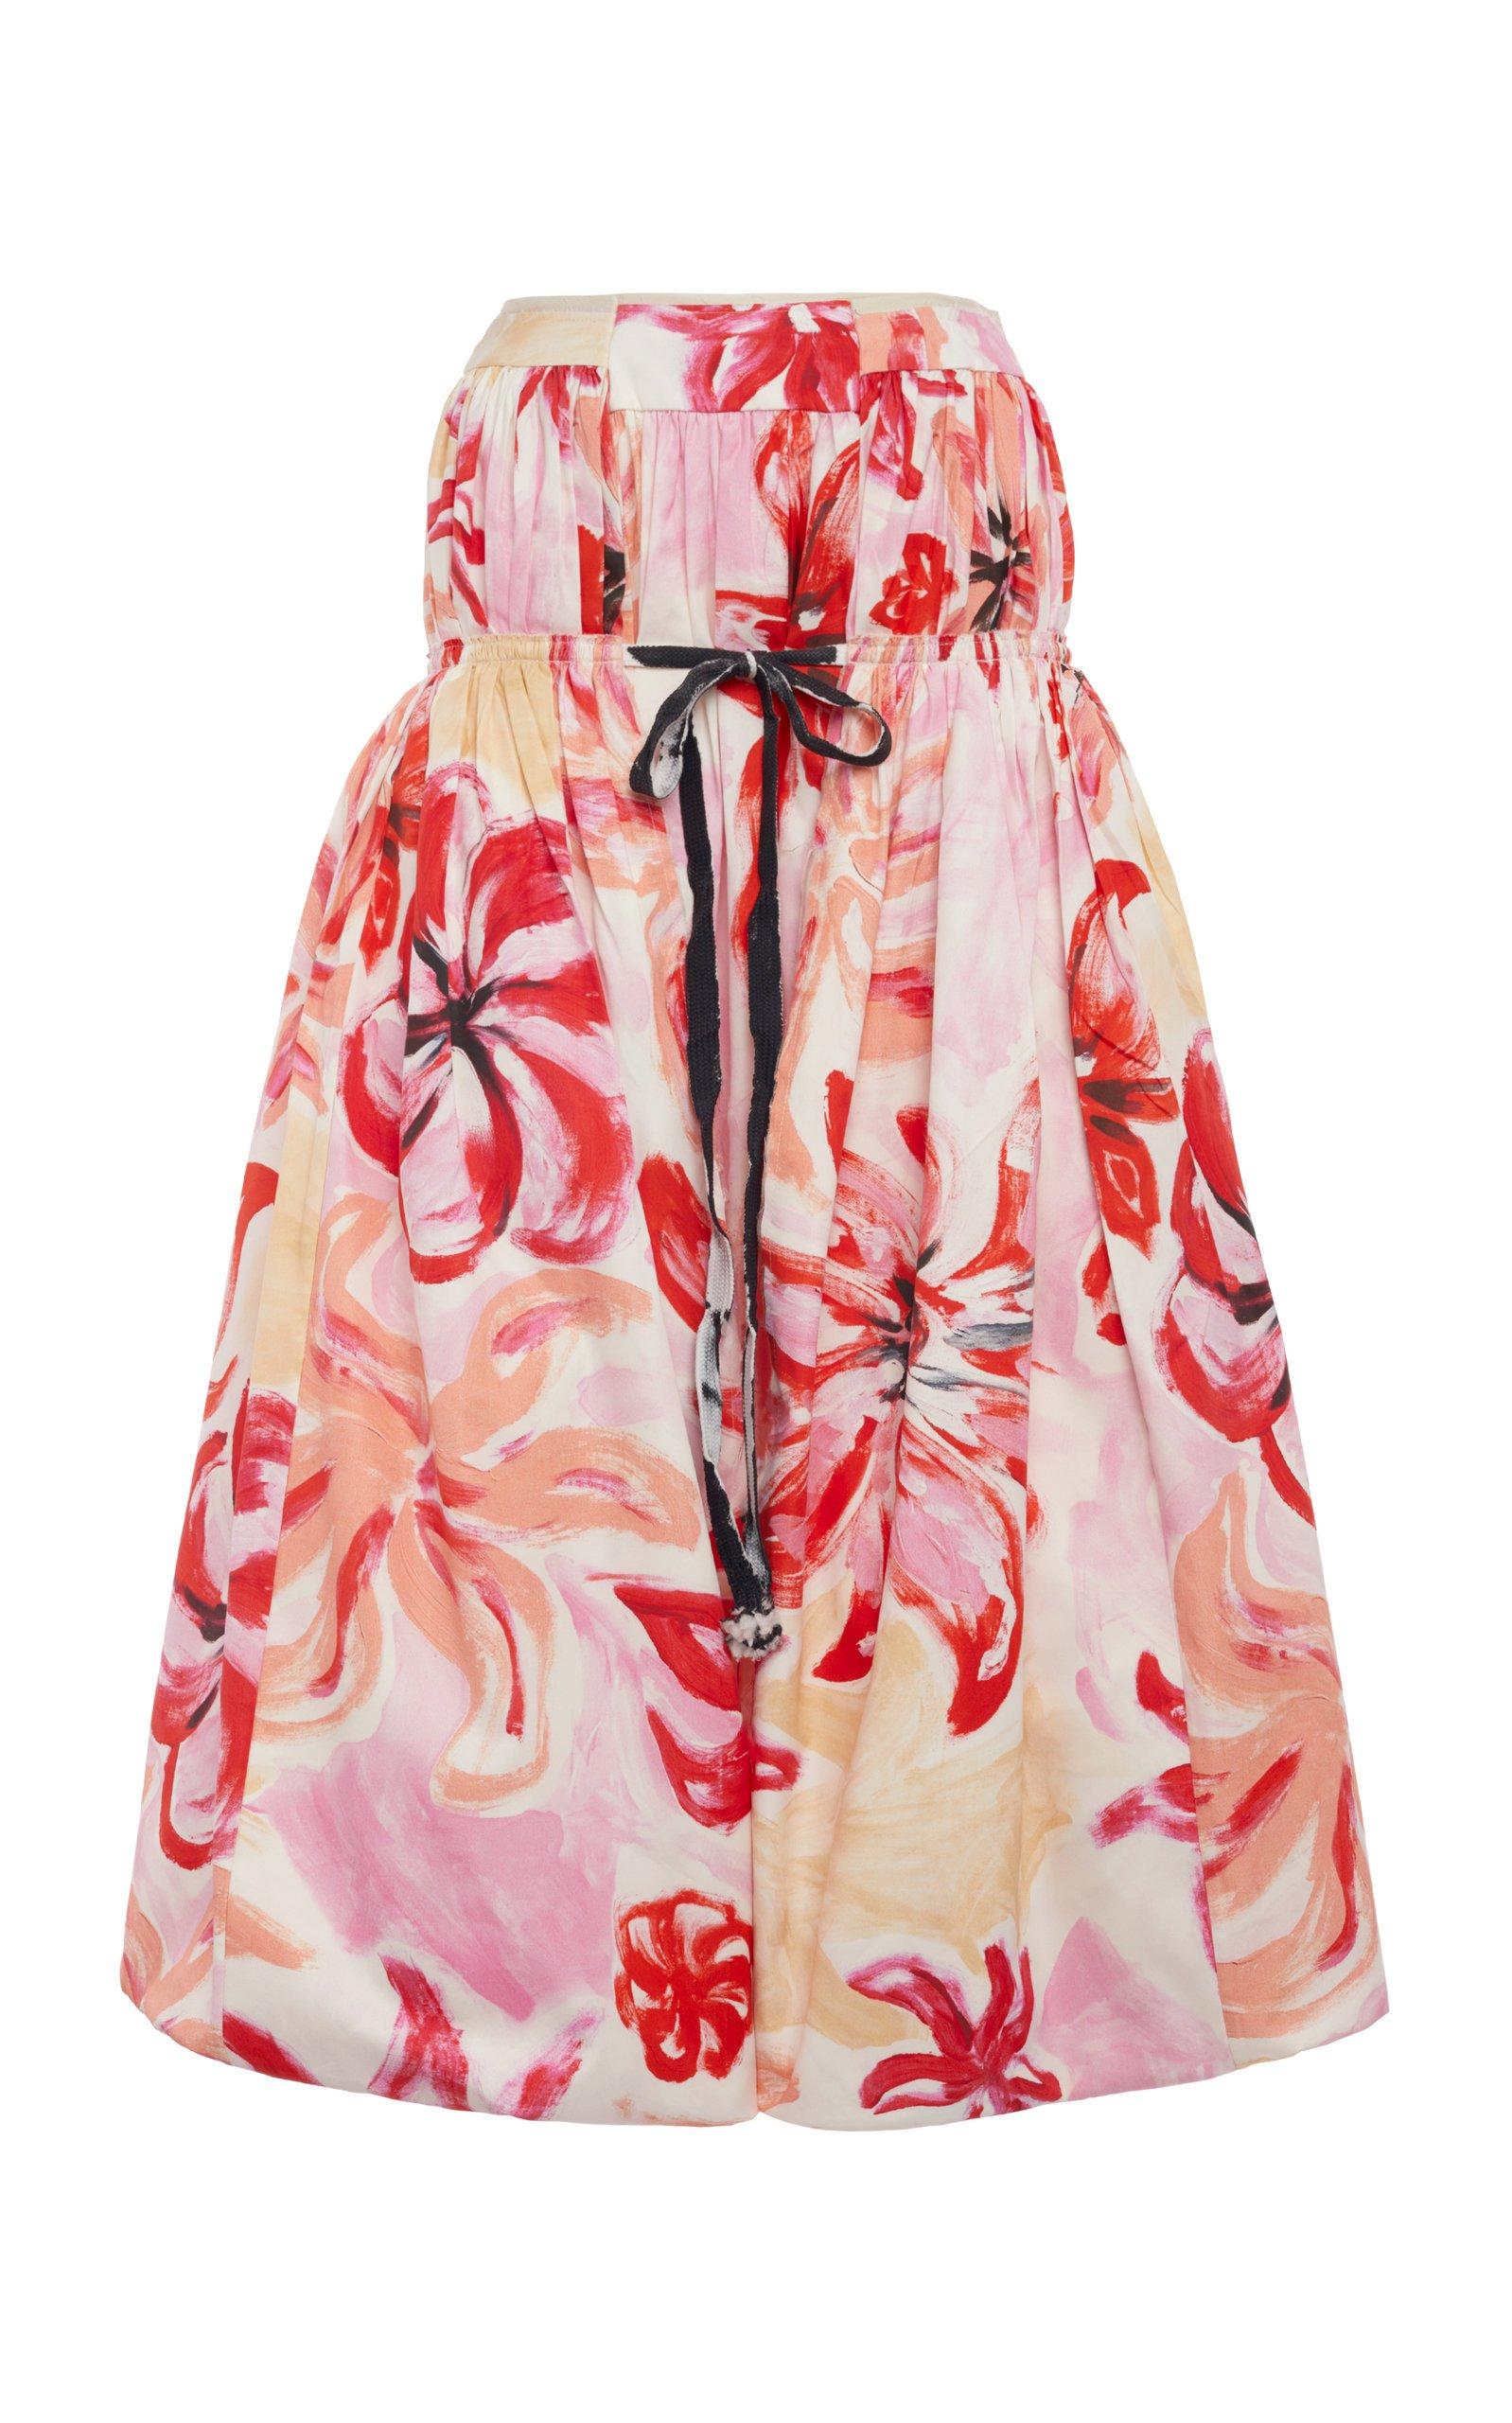 Marni Floral-Print Cotton-Silk Midi Skirt Size: 36